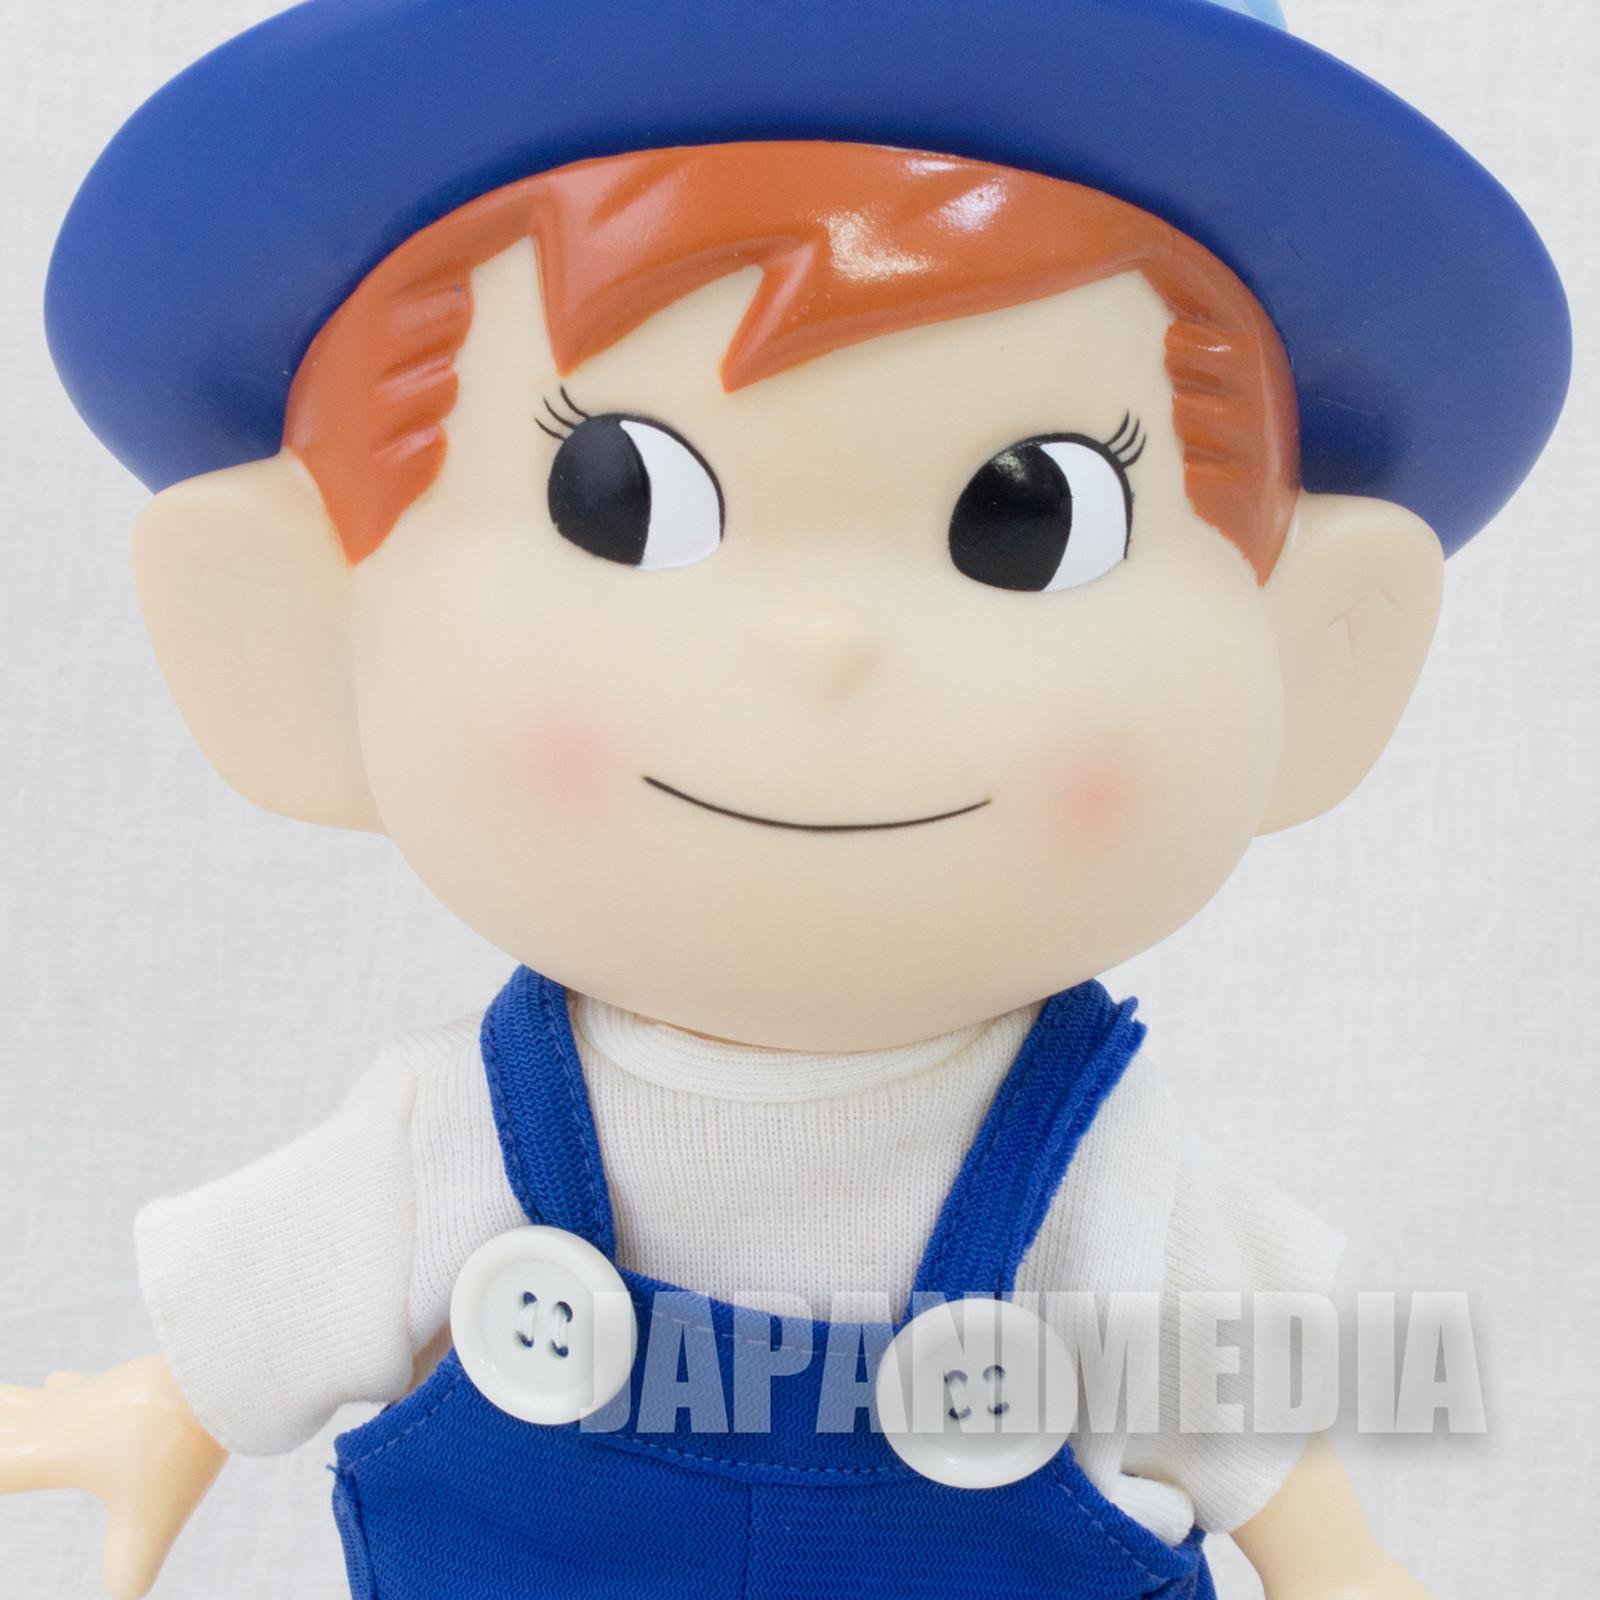 "Milky Candy Peko-chan POKO Soft Vinyl Figure 9.5"" FUJIYA JAPAN ANIME"